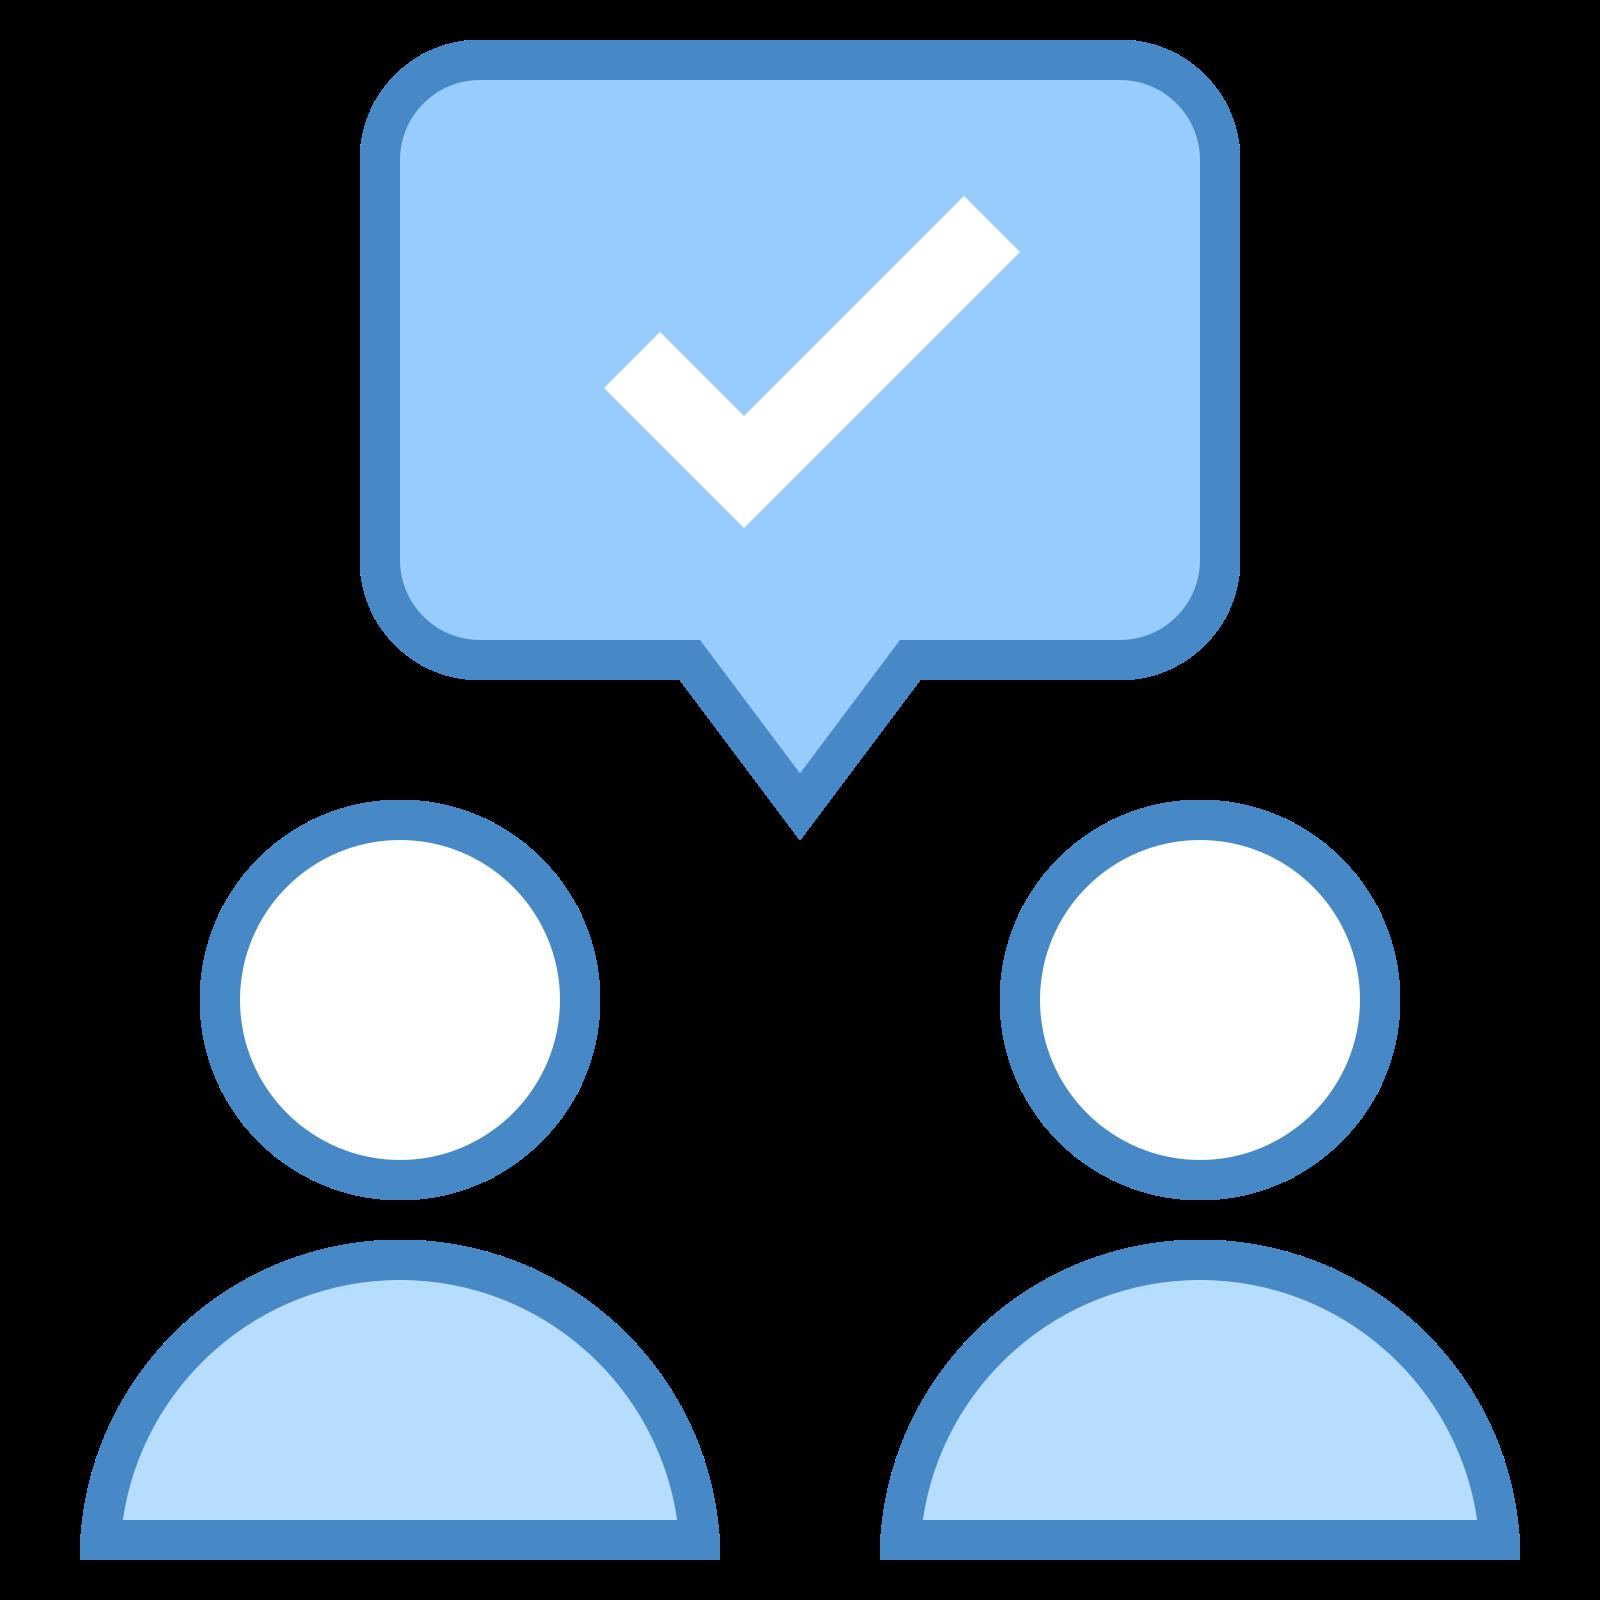 Group Task icon